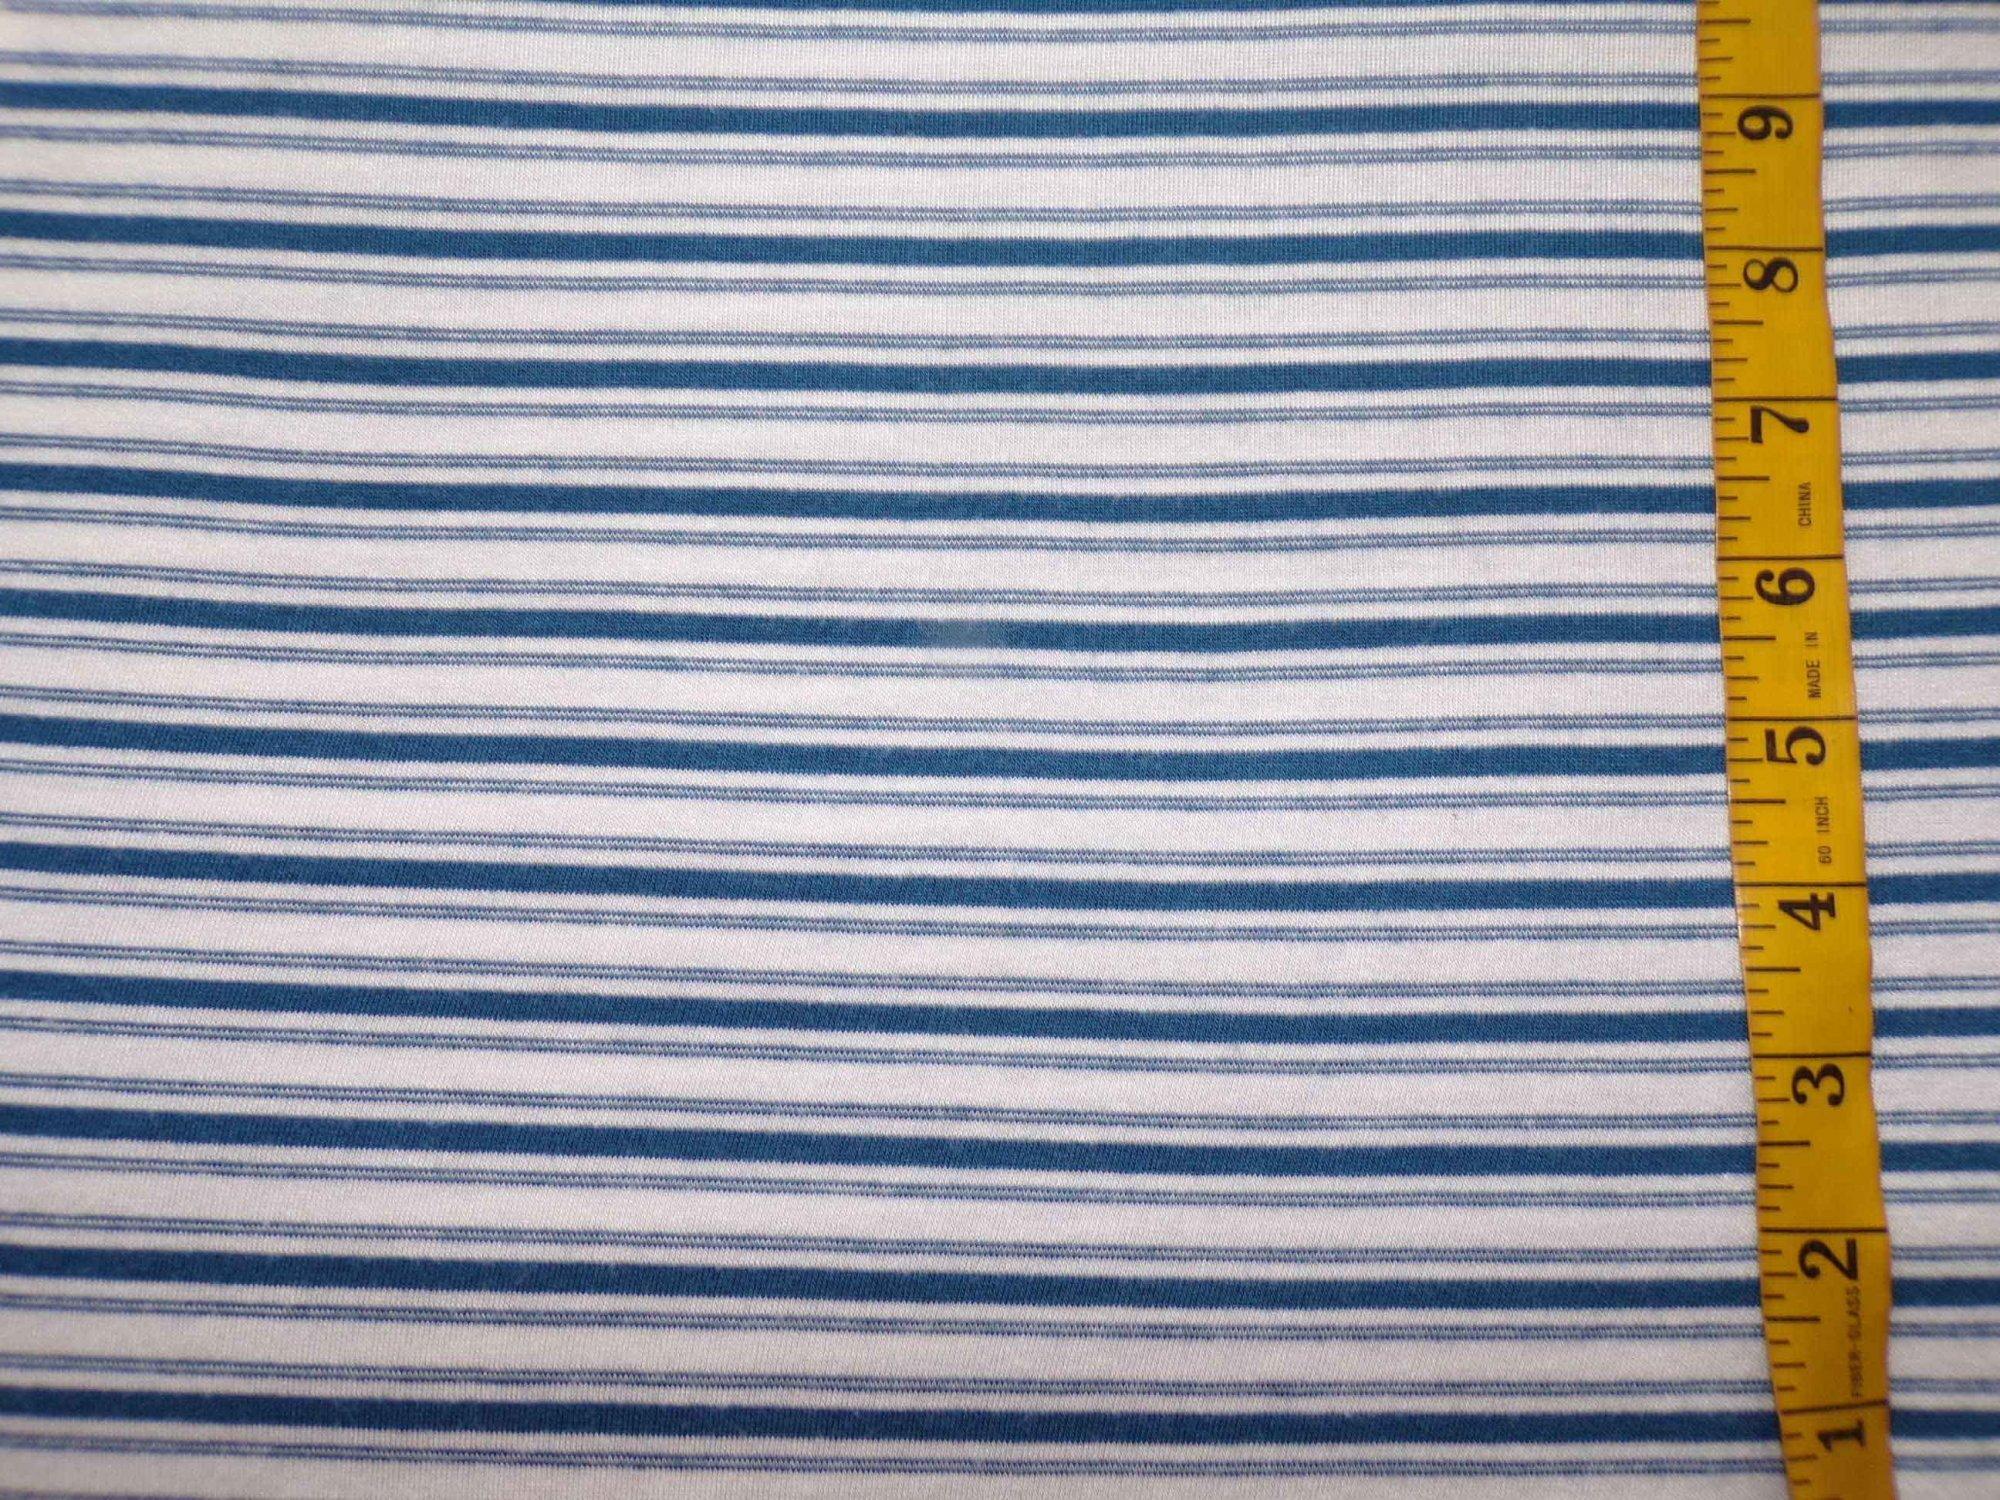 Cotton Lycra Jersey Sweater Knit Stripes - Marine Blue and White